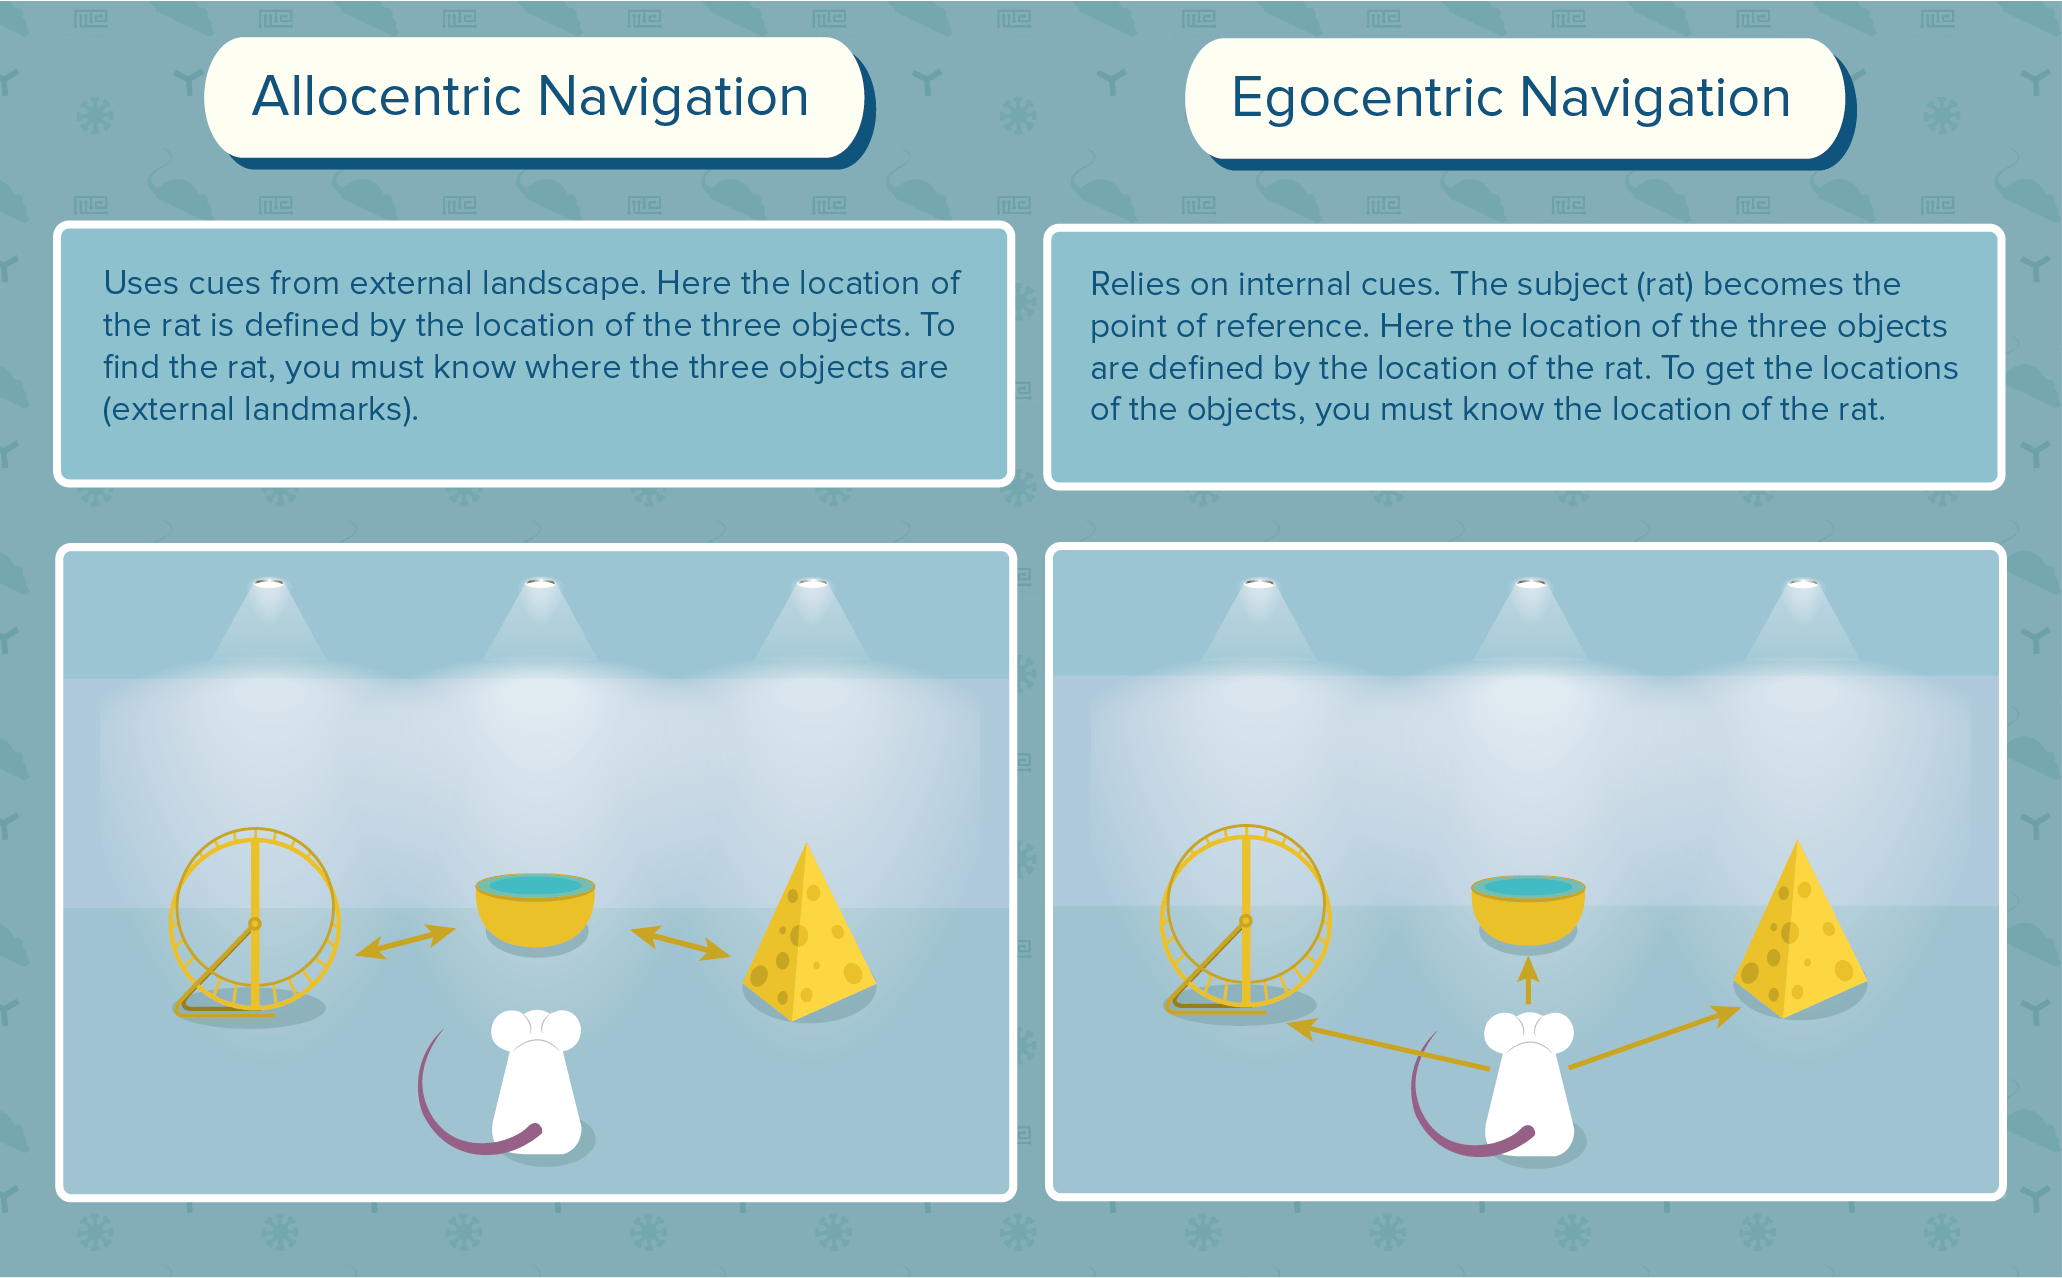 Spatial learning: allocentric navigation vs egocentric navigation